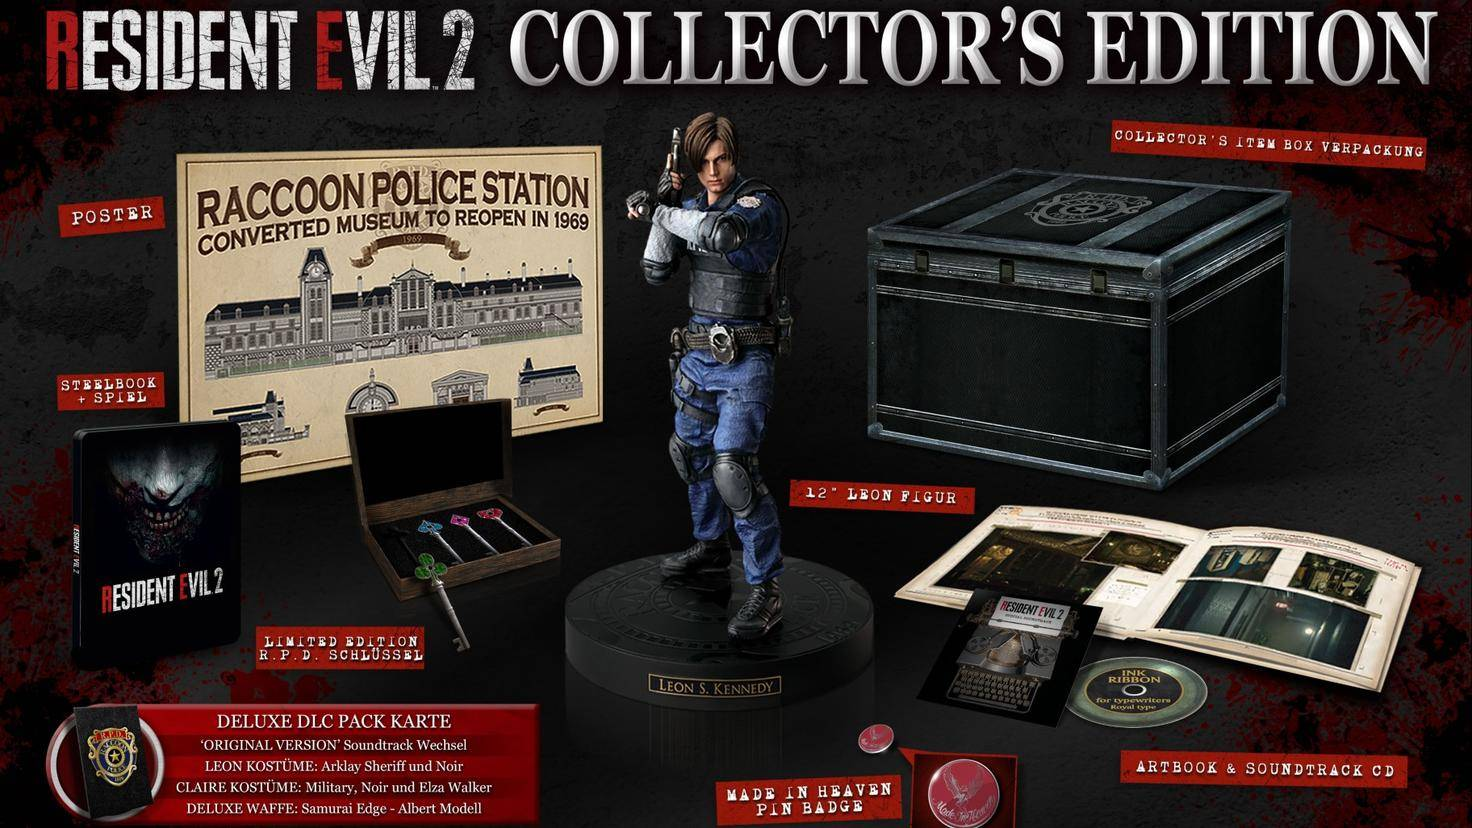 resident-evil-2-collectors-edition-pack-capcom